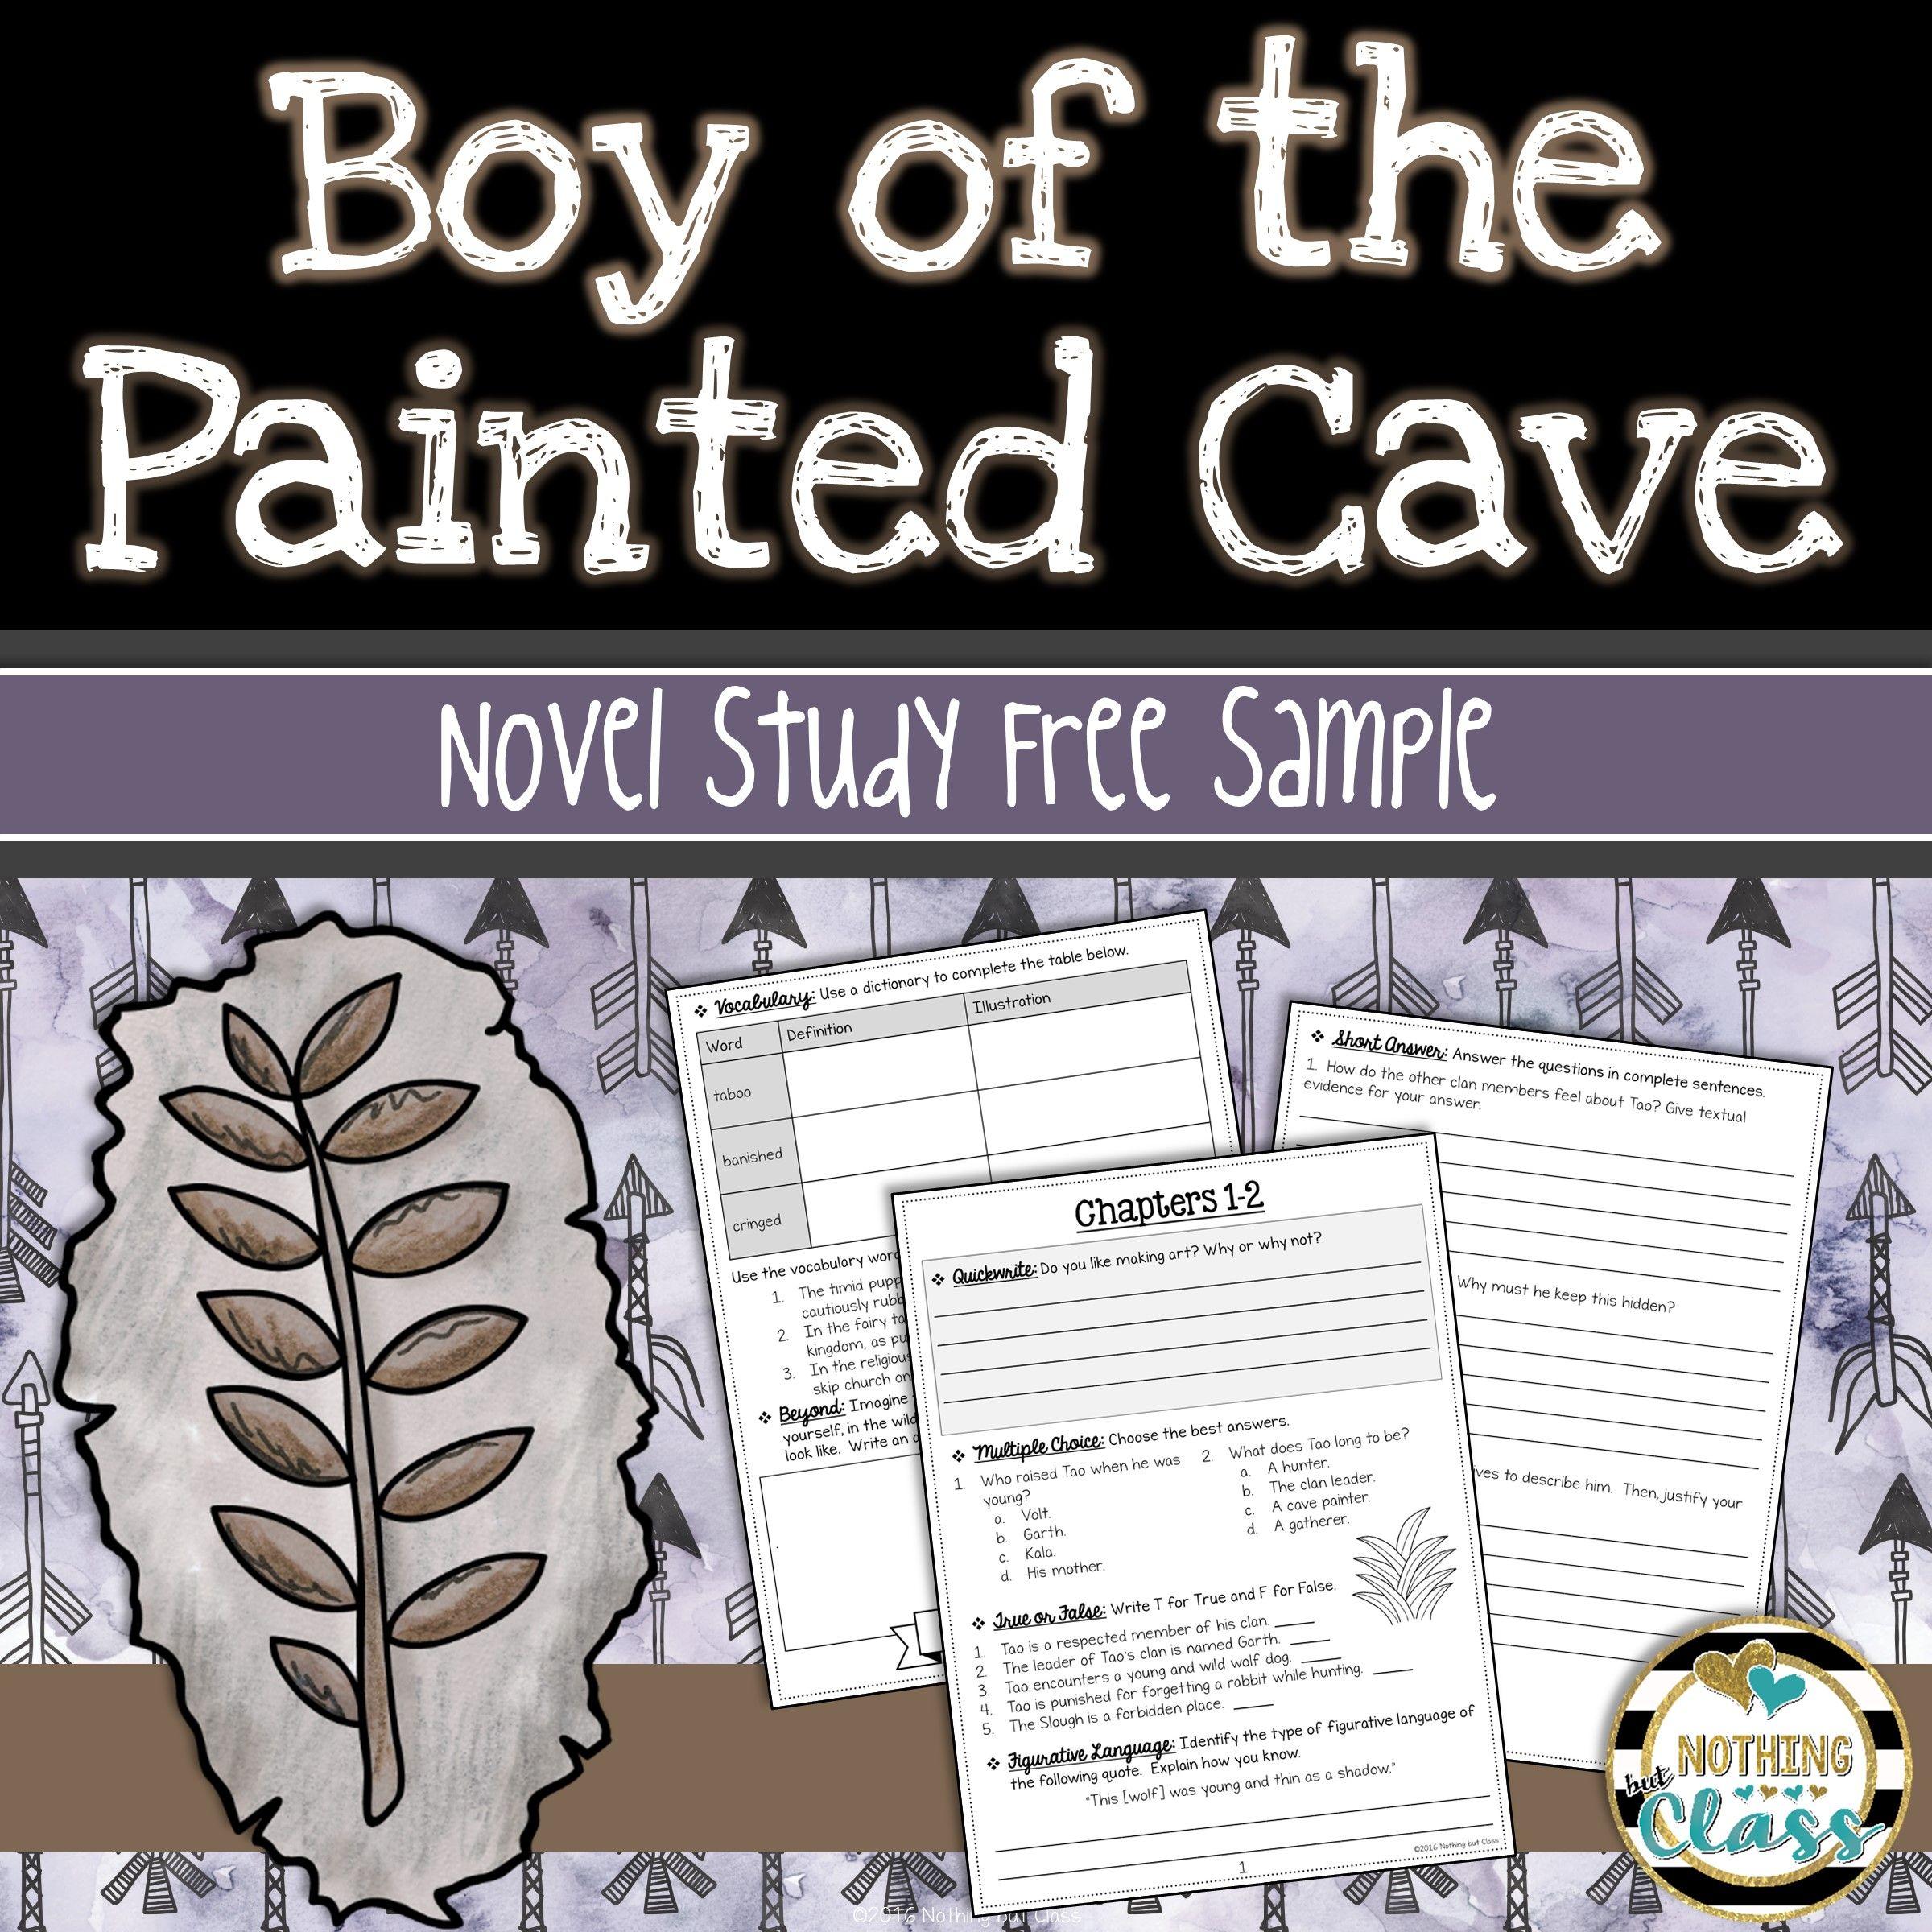 The Bfg Novel Study Unit Free Sample Pinterestcom